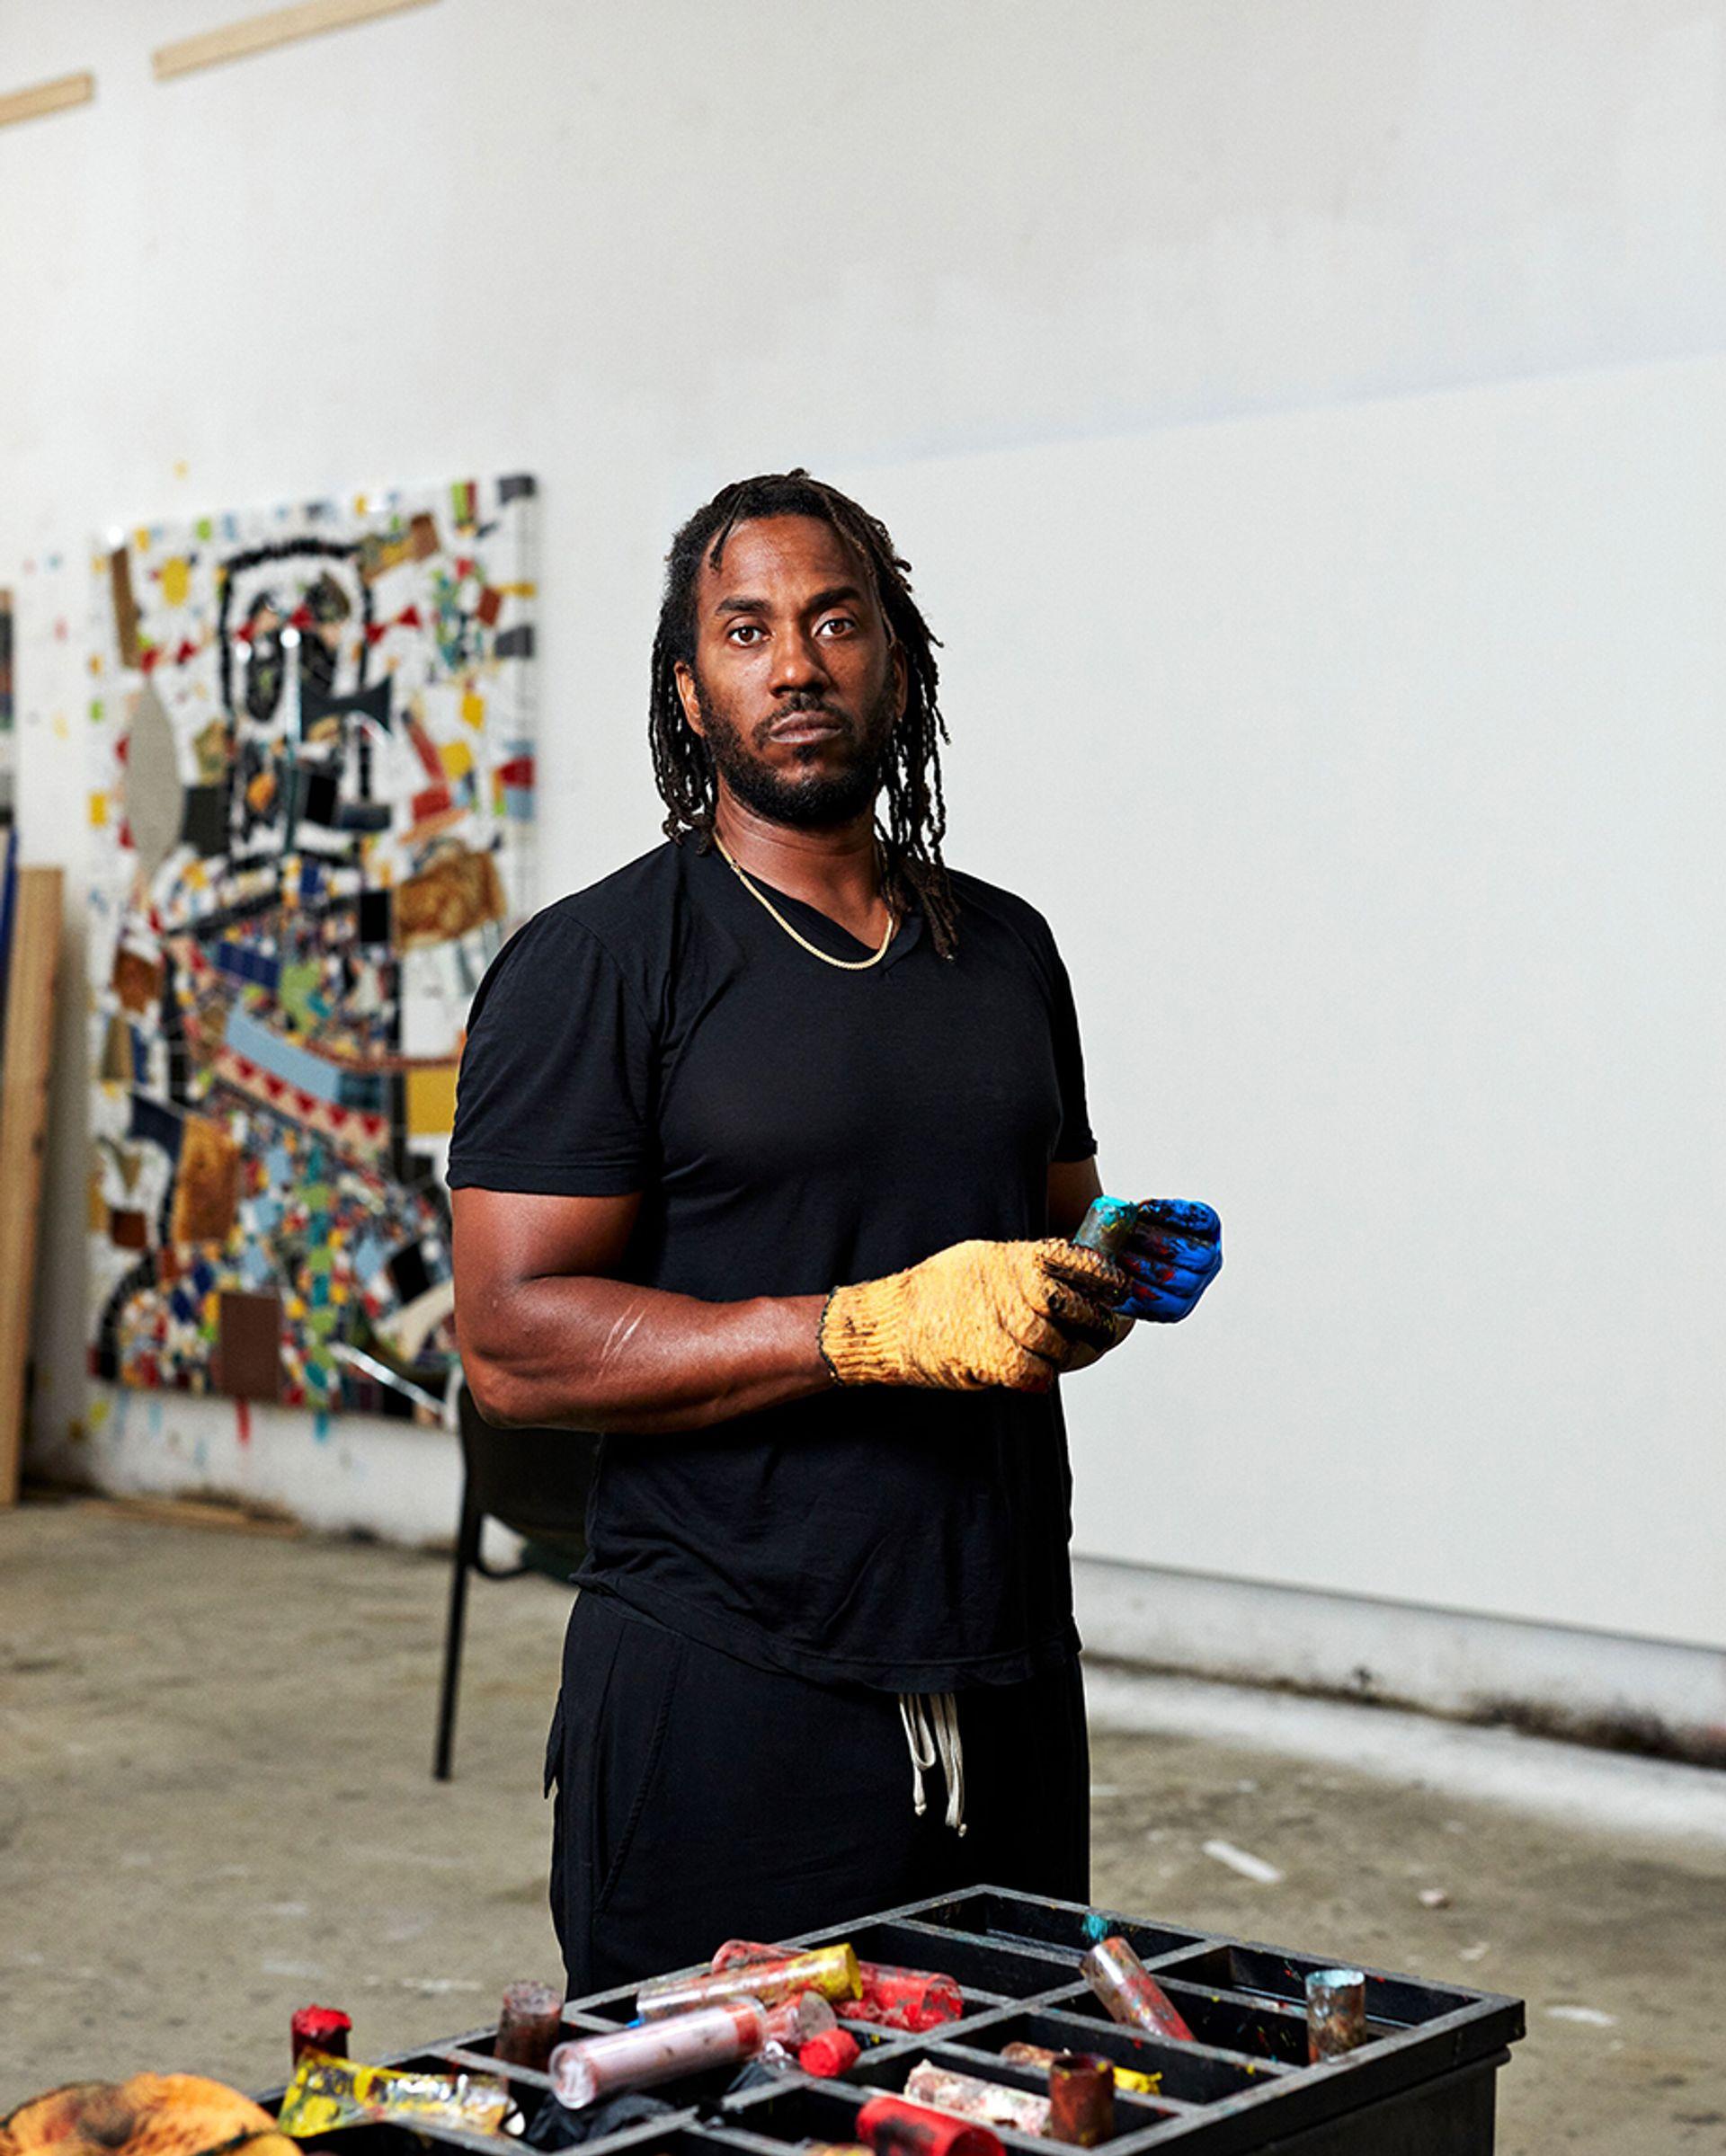 Rashid Johnson in the studio 2020 © Rashid Johnson. Courtesy the artist and Hauser & Wirth Photo: Axel Dupeux